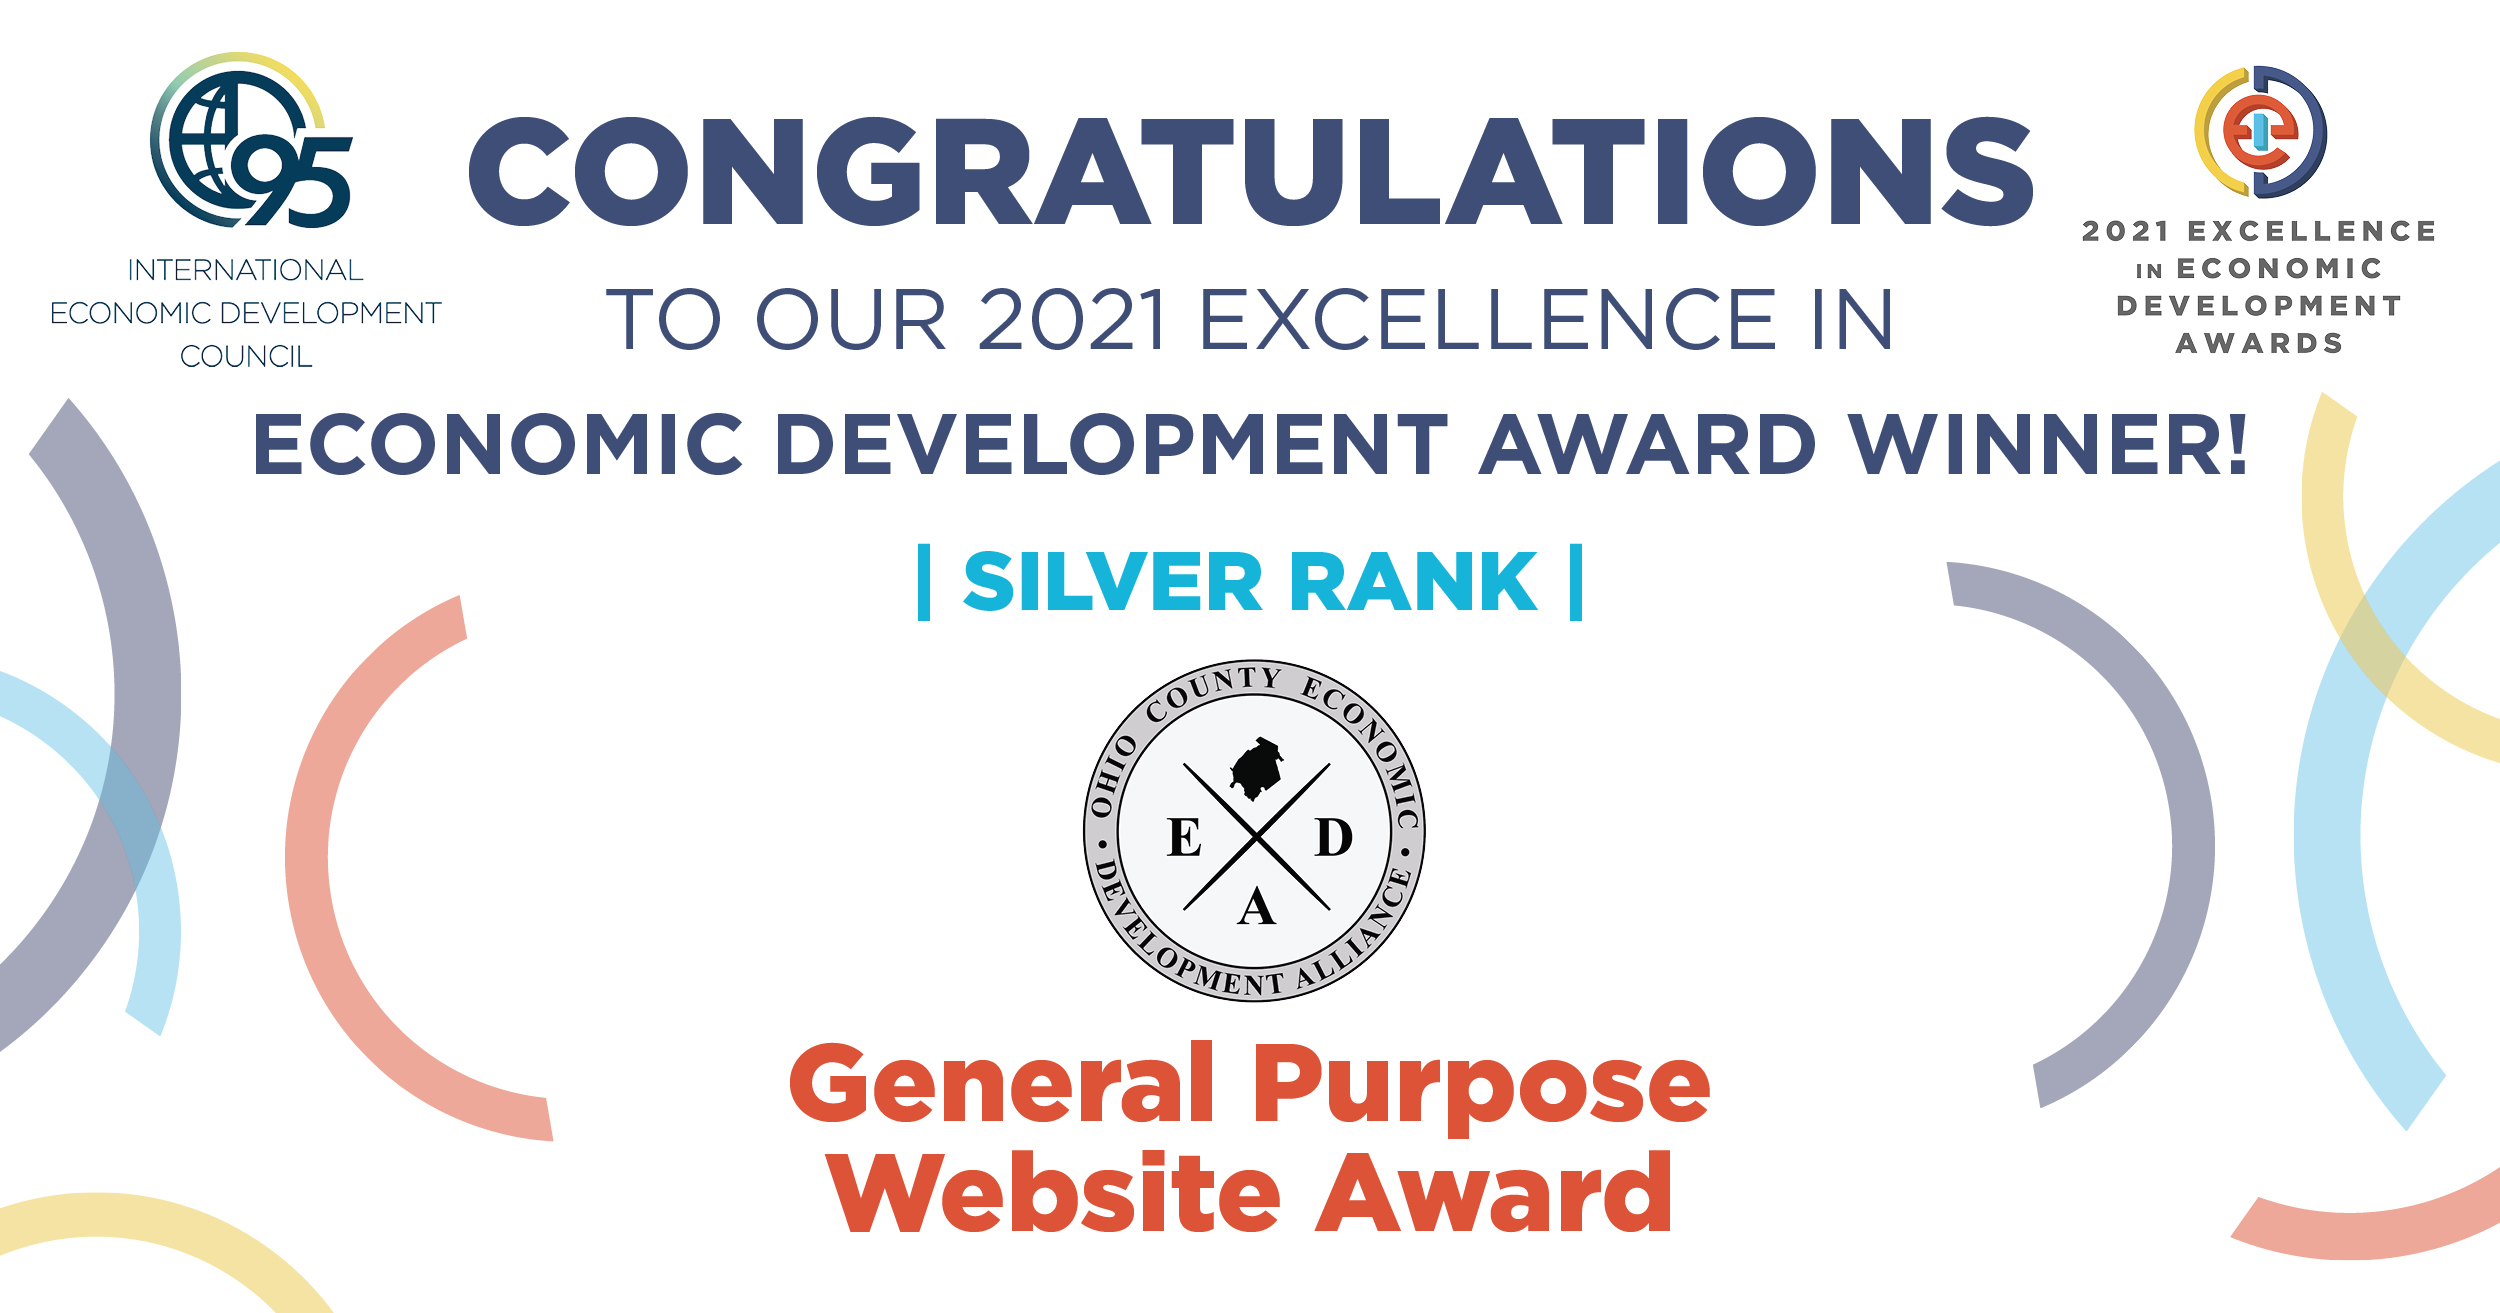 Ohio County Economic Development Alliance Receives Excellence in Economic Development Award from the International Economic Development Council Main Photo